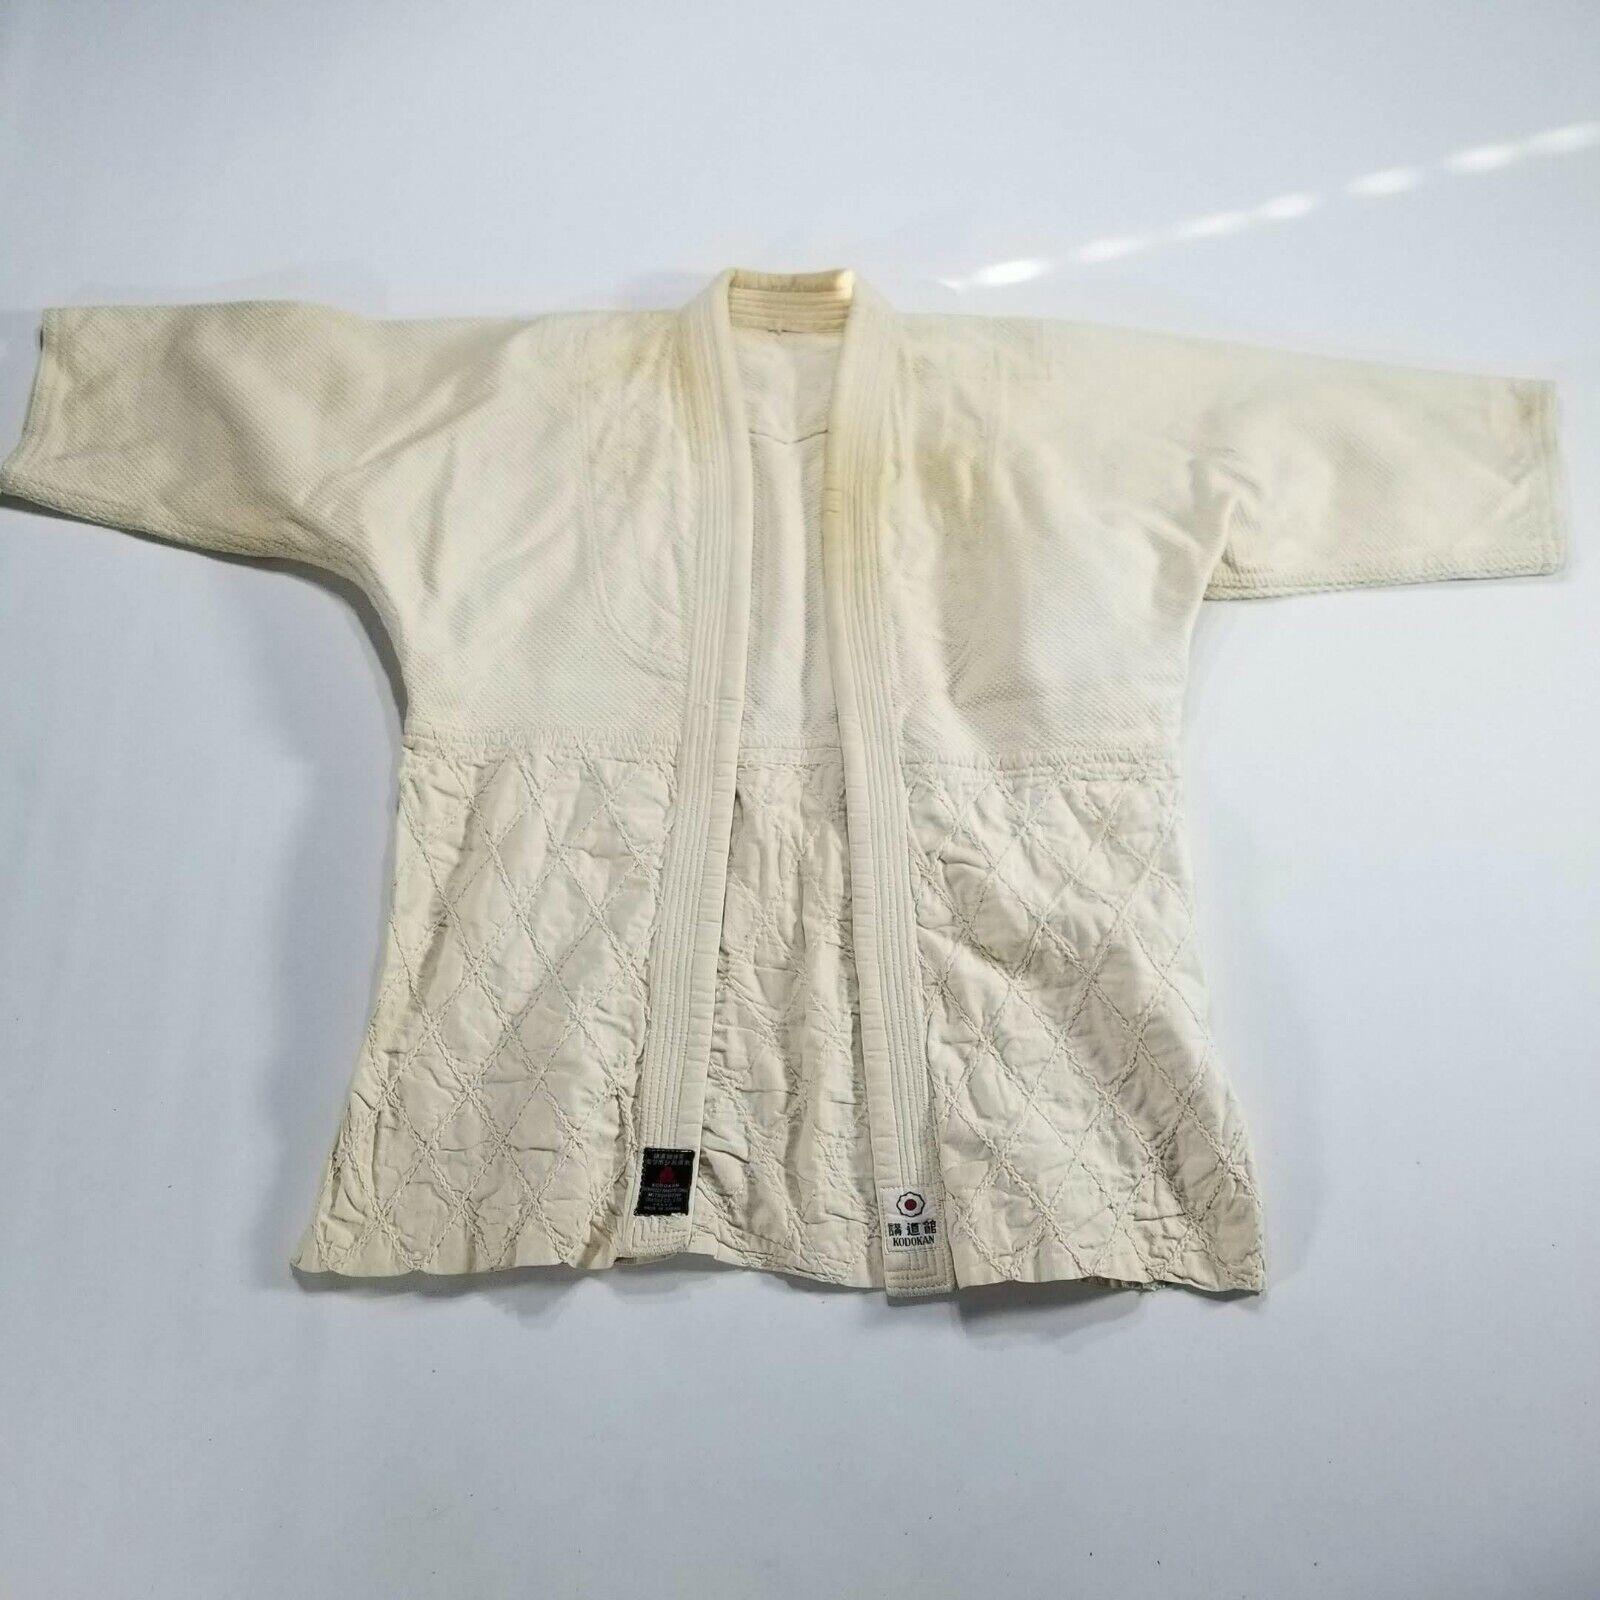 Mitsuboshi Brand Kodokan Vintage 1970s Judo Uniform Outfit Quilted Japan Rare